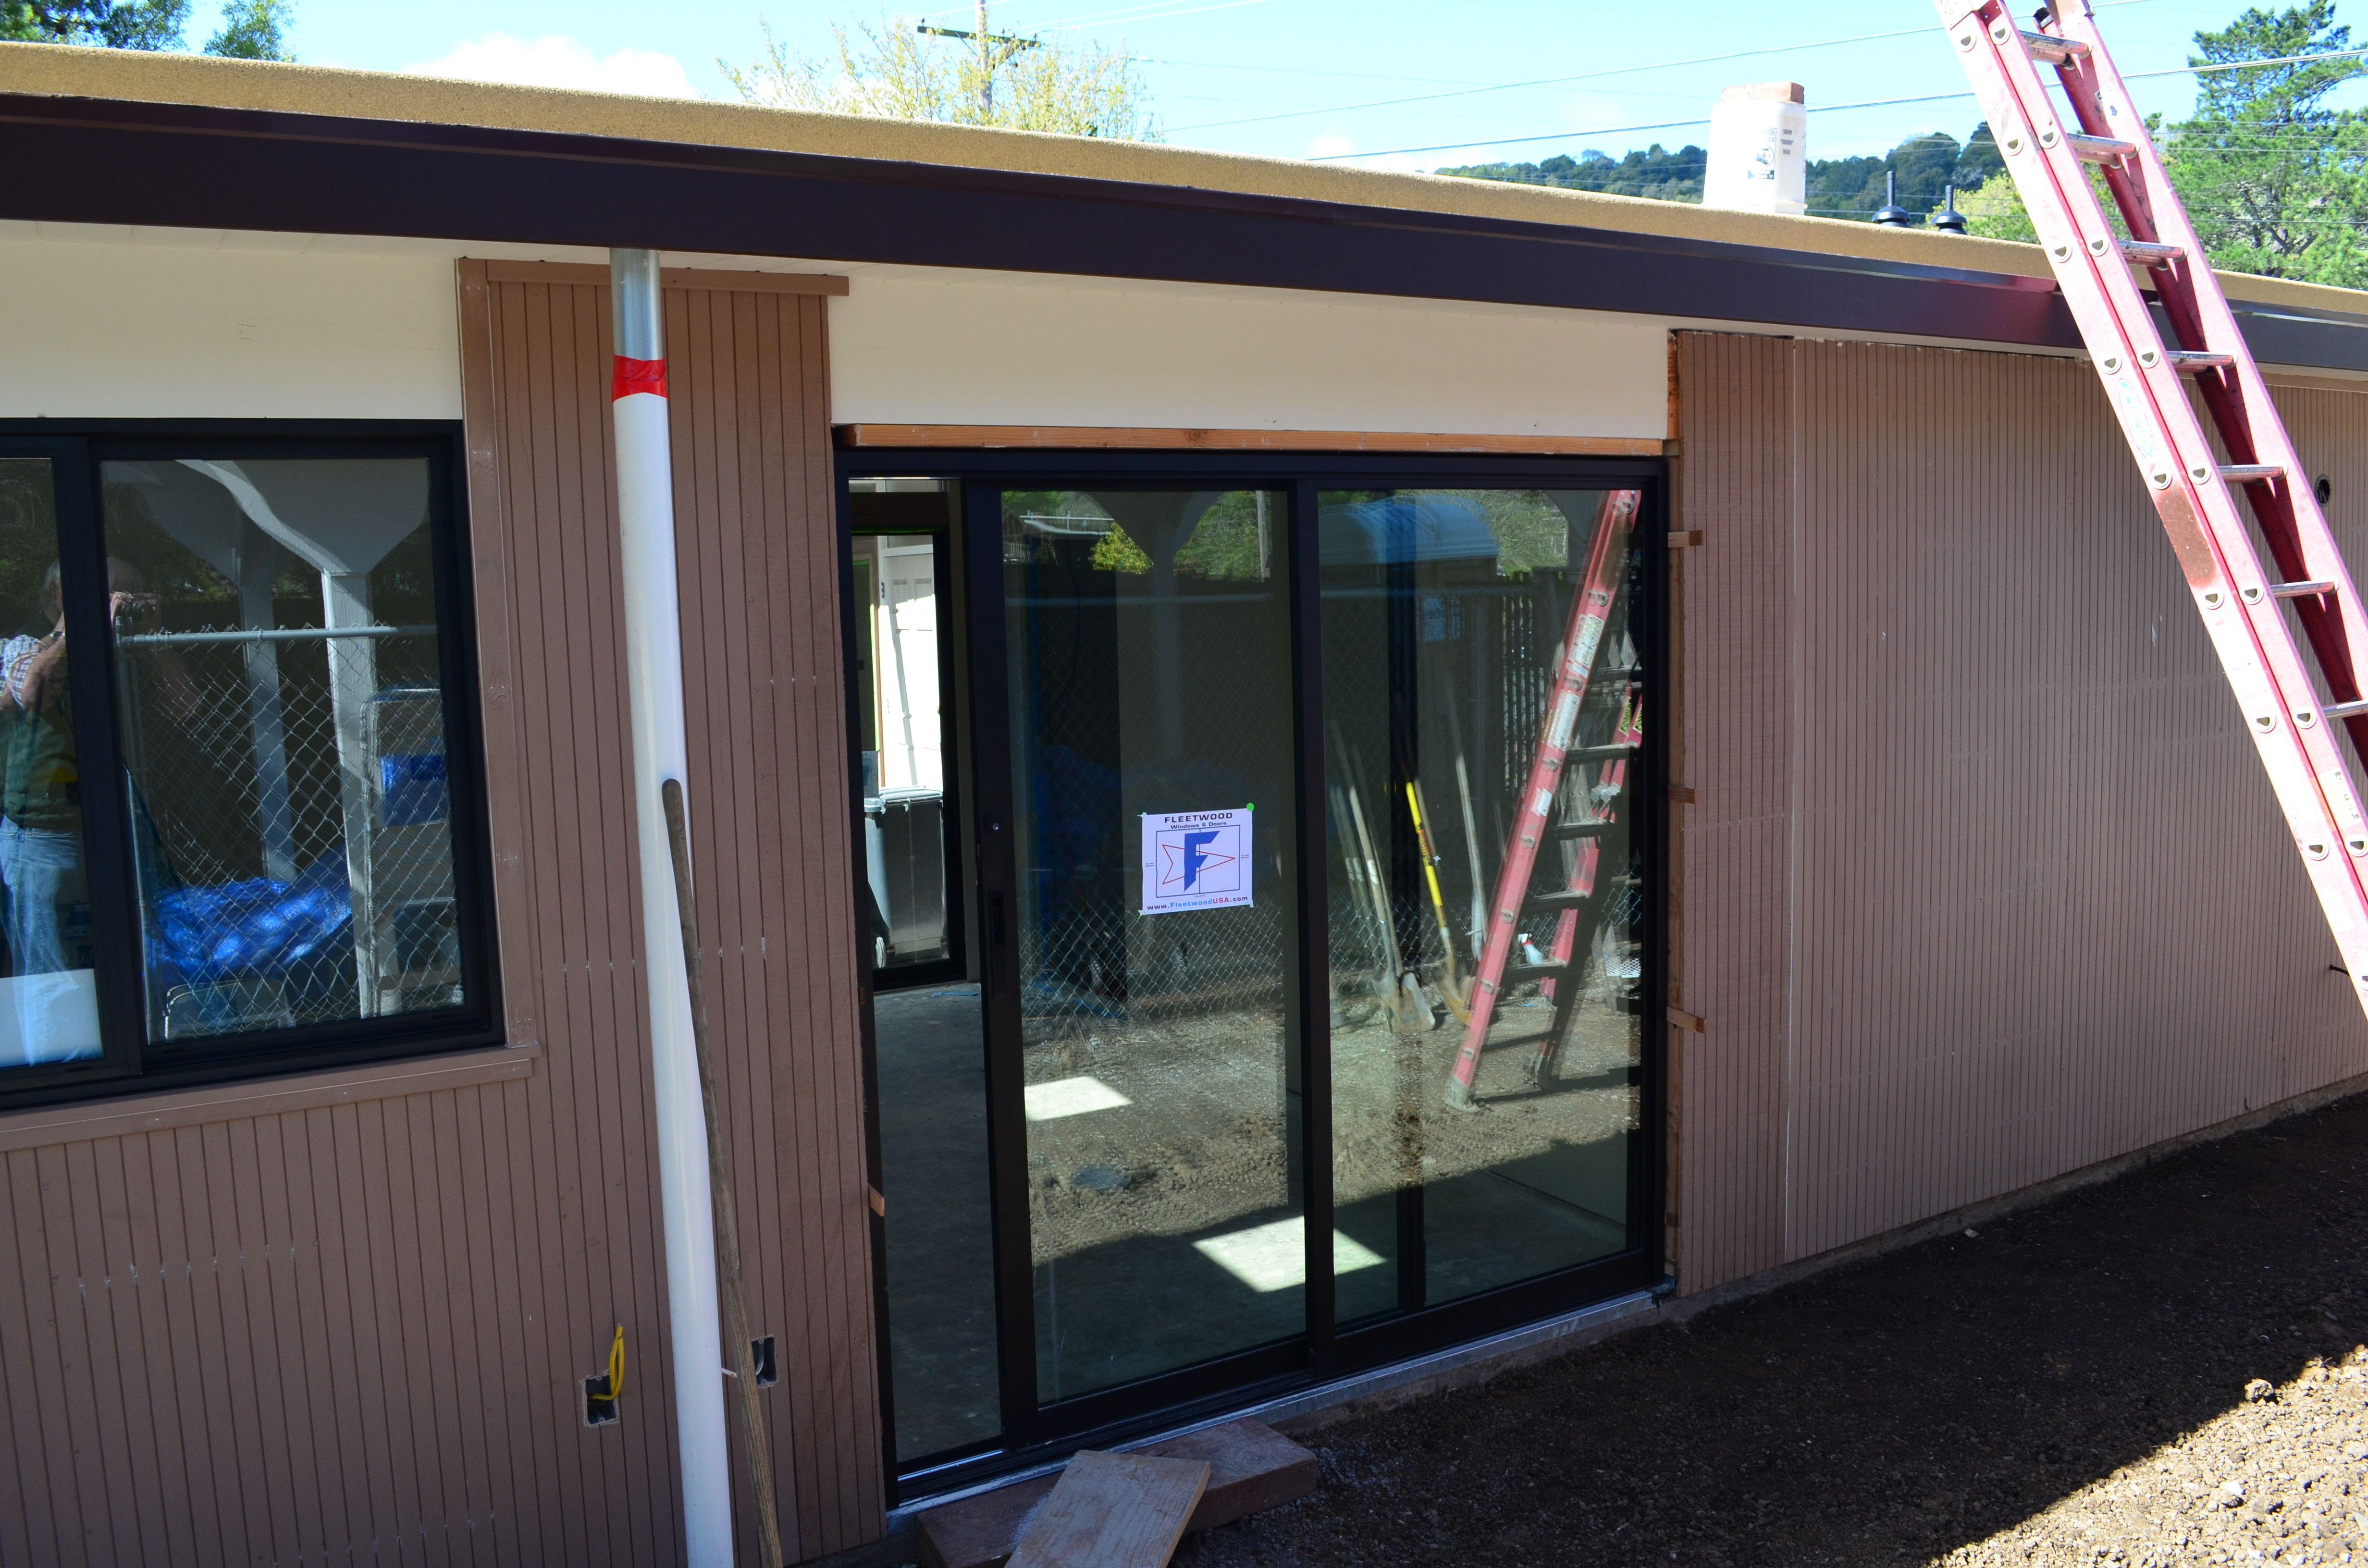 Milgard Aluminum Windows | Posts From The U0027Fleetwood Windows And Doorsu0027  Category